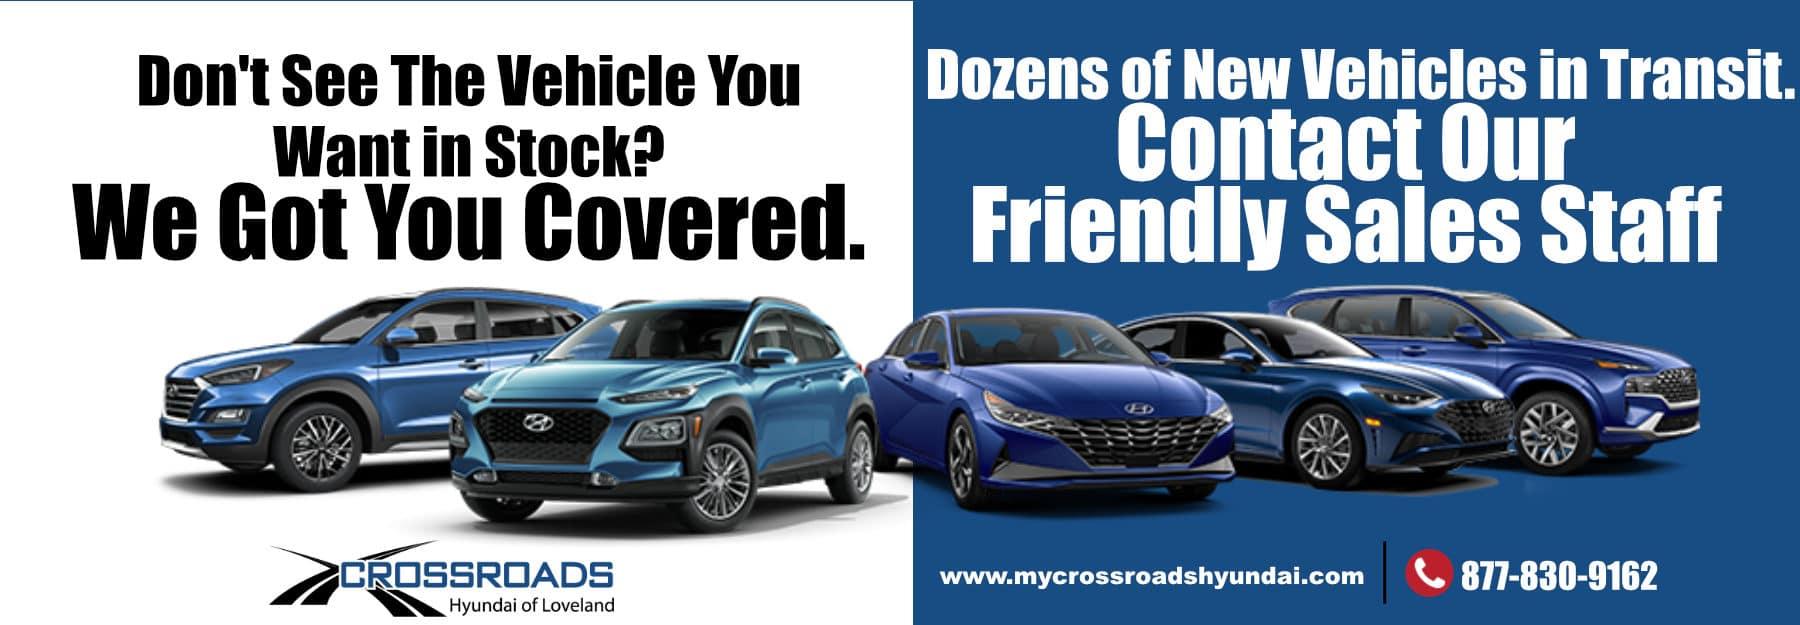 April_2021_We Got You Covered_Crossroads Hyundai